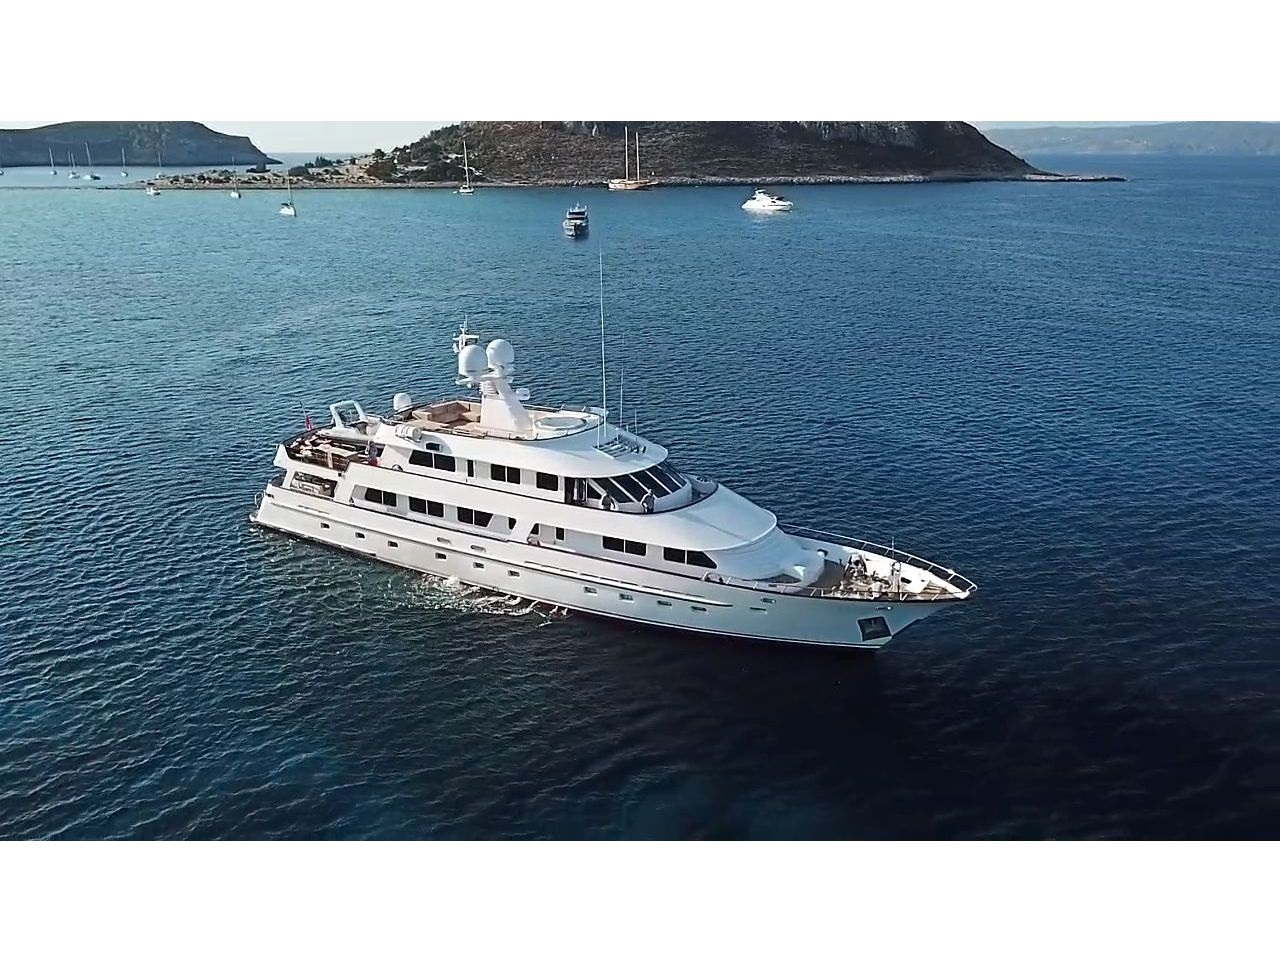 M/Y ATLAS Yacht for Sale